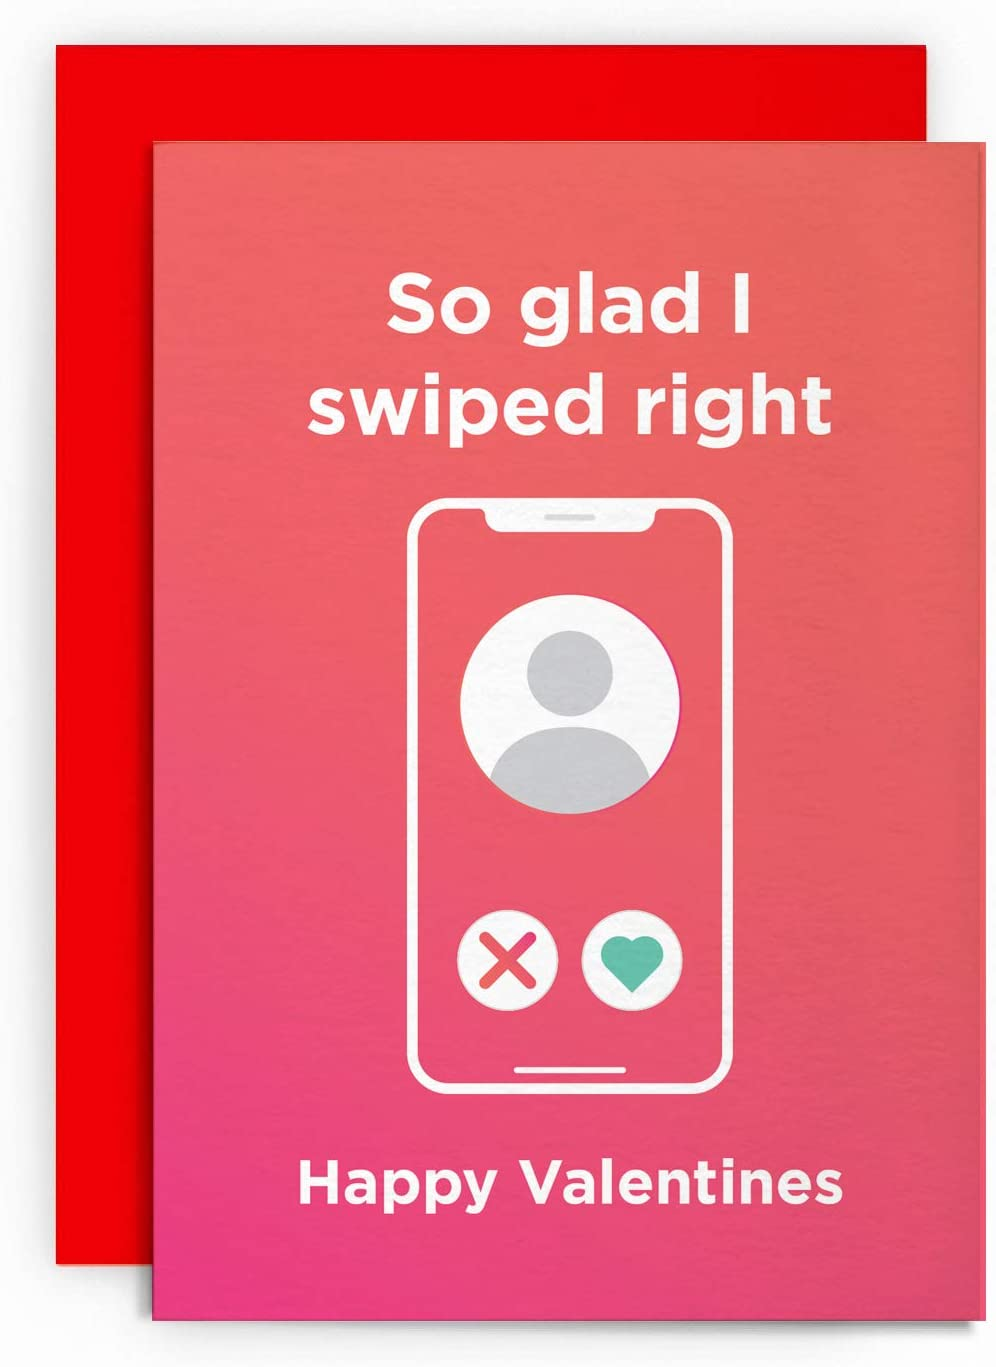 Valentines Day Card Valentines Funny Tinder Husband Wife Boyfriend Girlfriend Love Greeting Happy for Him Her Joke LOL SO Glad I Swiped Right